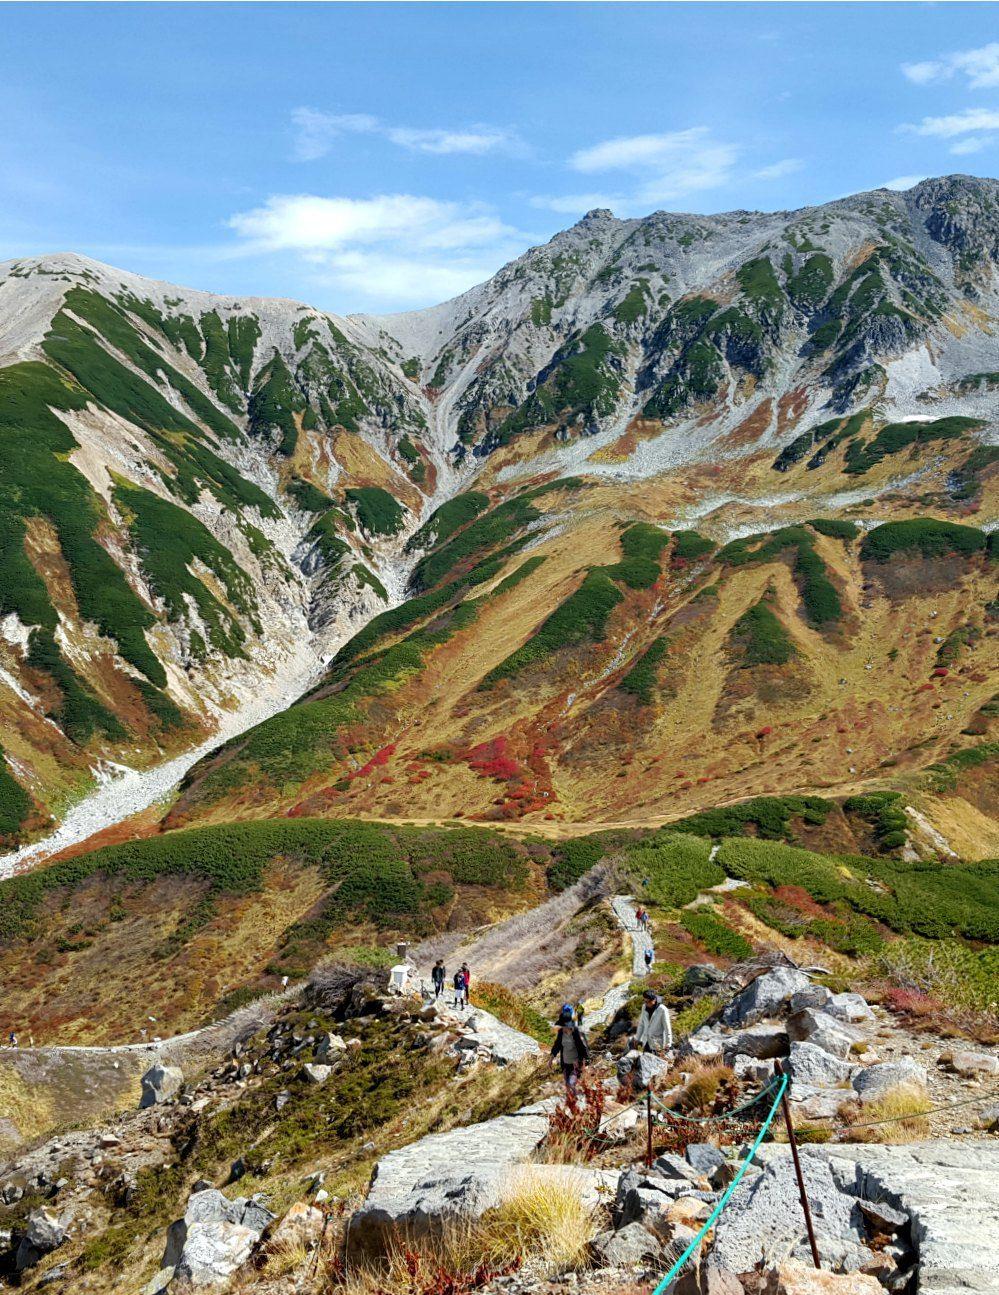 Views near Murodo on the Tateyama Kurobe Alpine Route in Japan